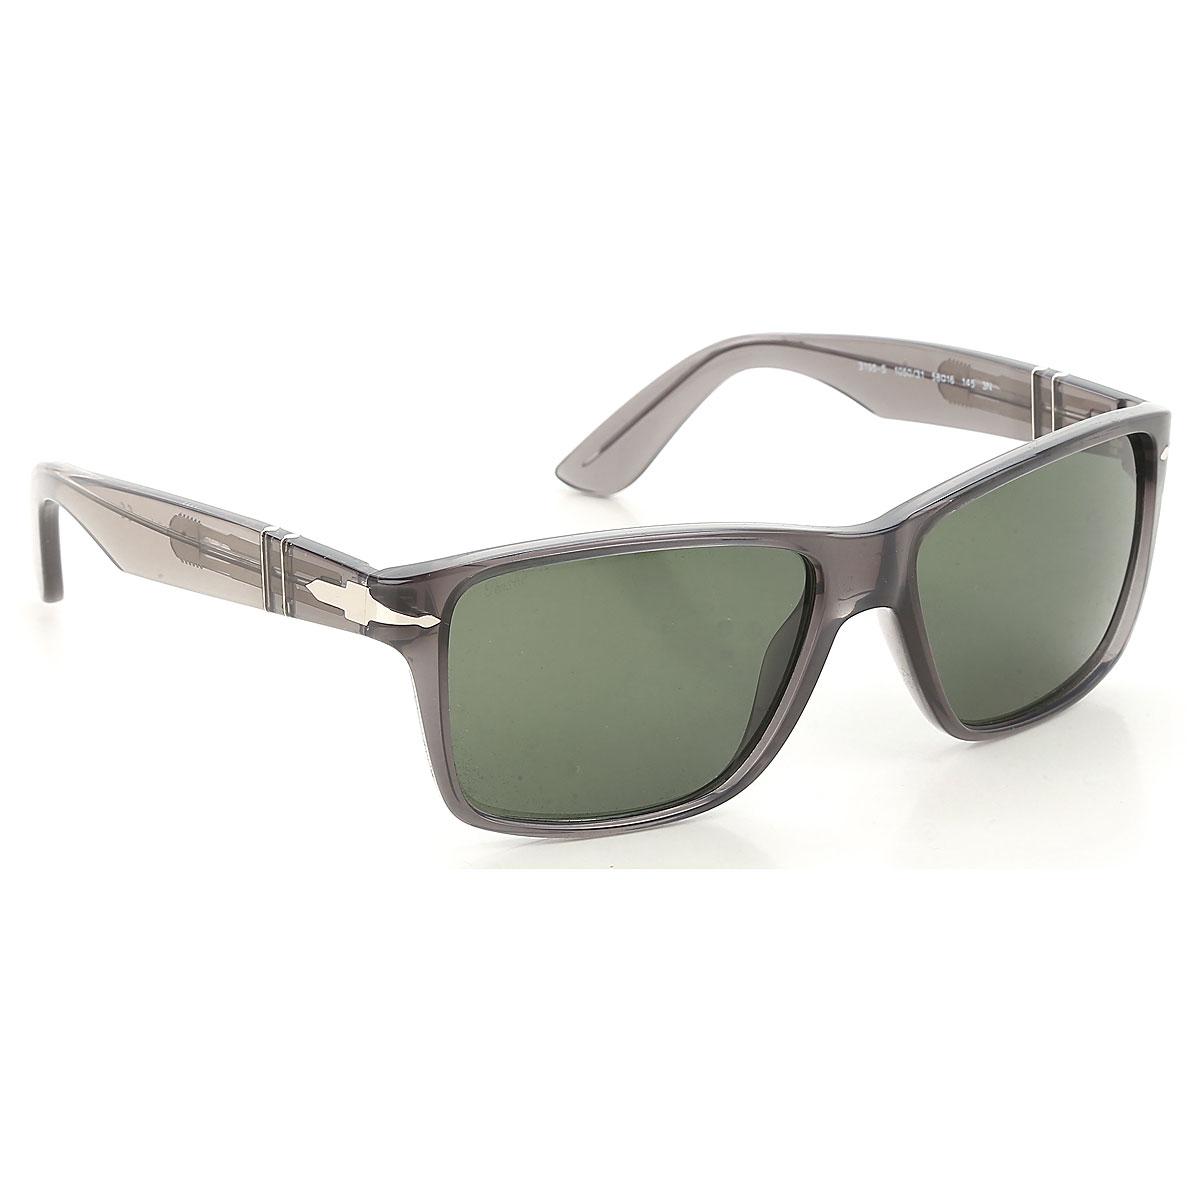 Persol Sunglasses On Sale, Transparent Grey, 2019